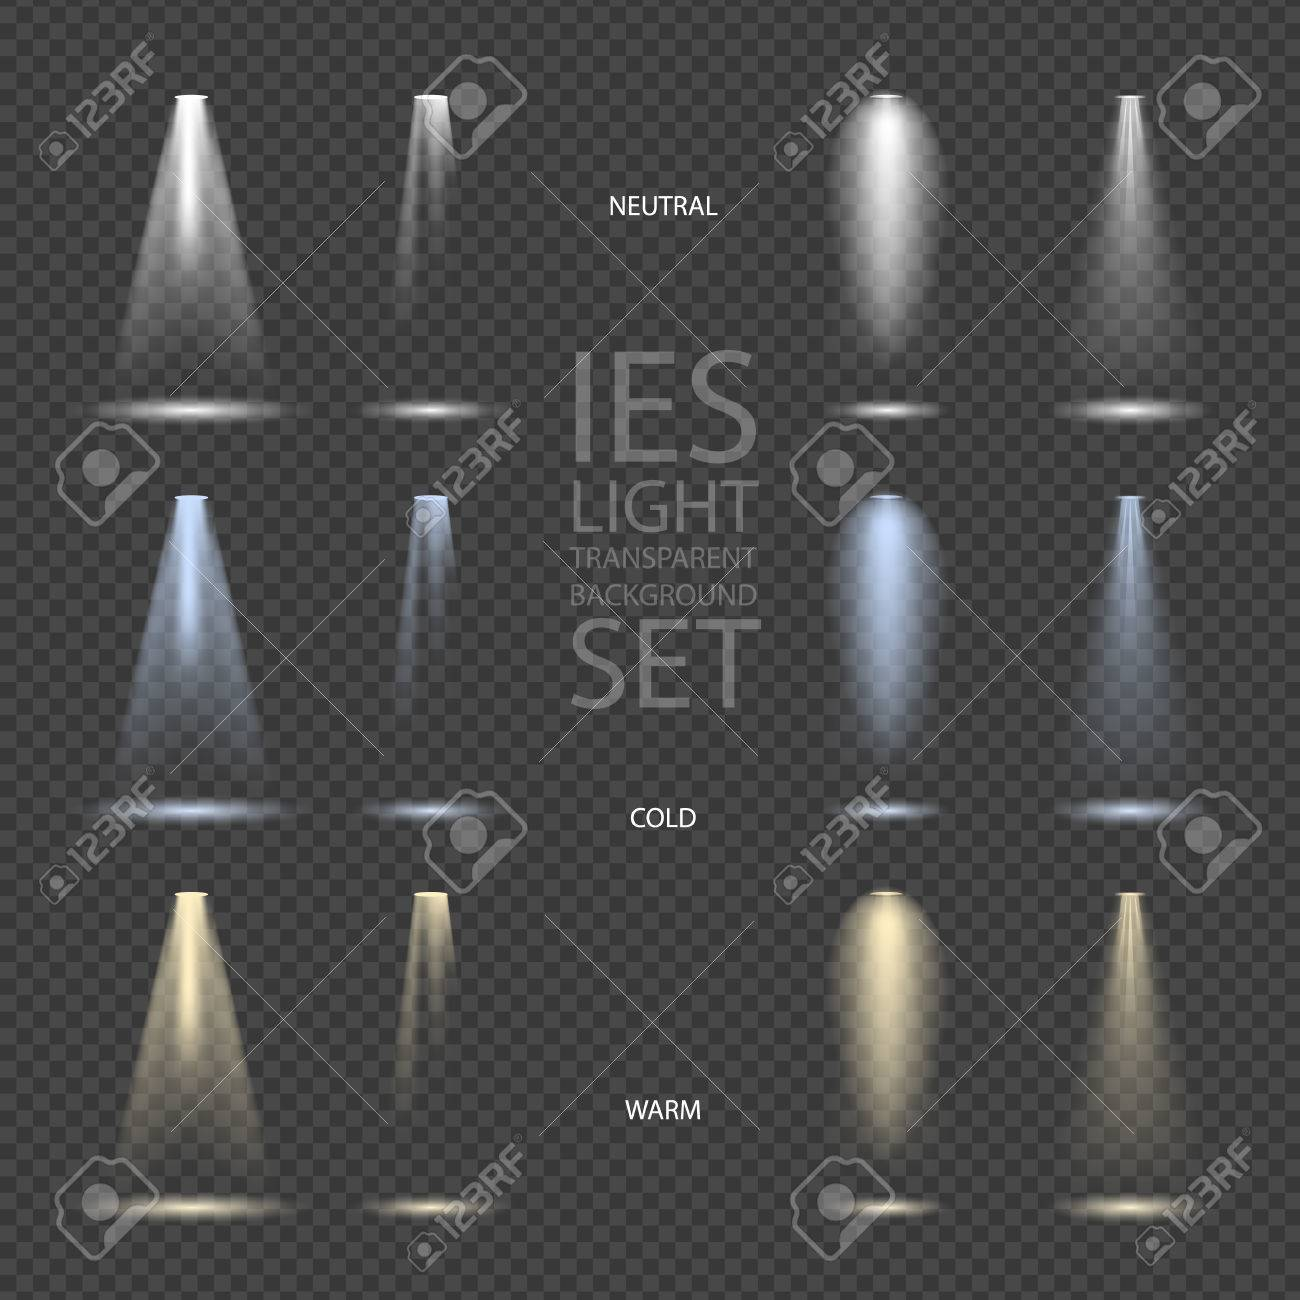 Light Effect Spotlight with Transparent Background Set - 56833342